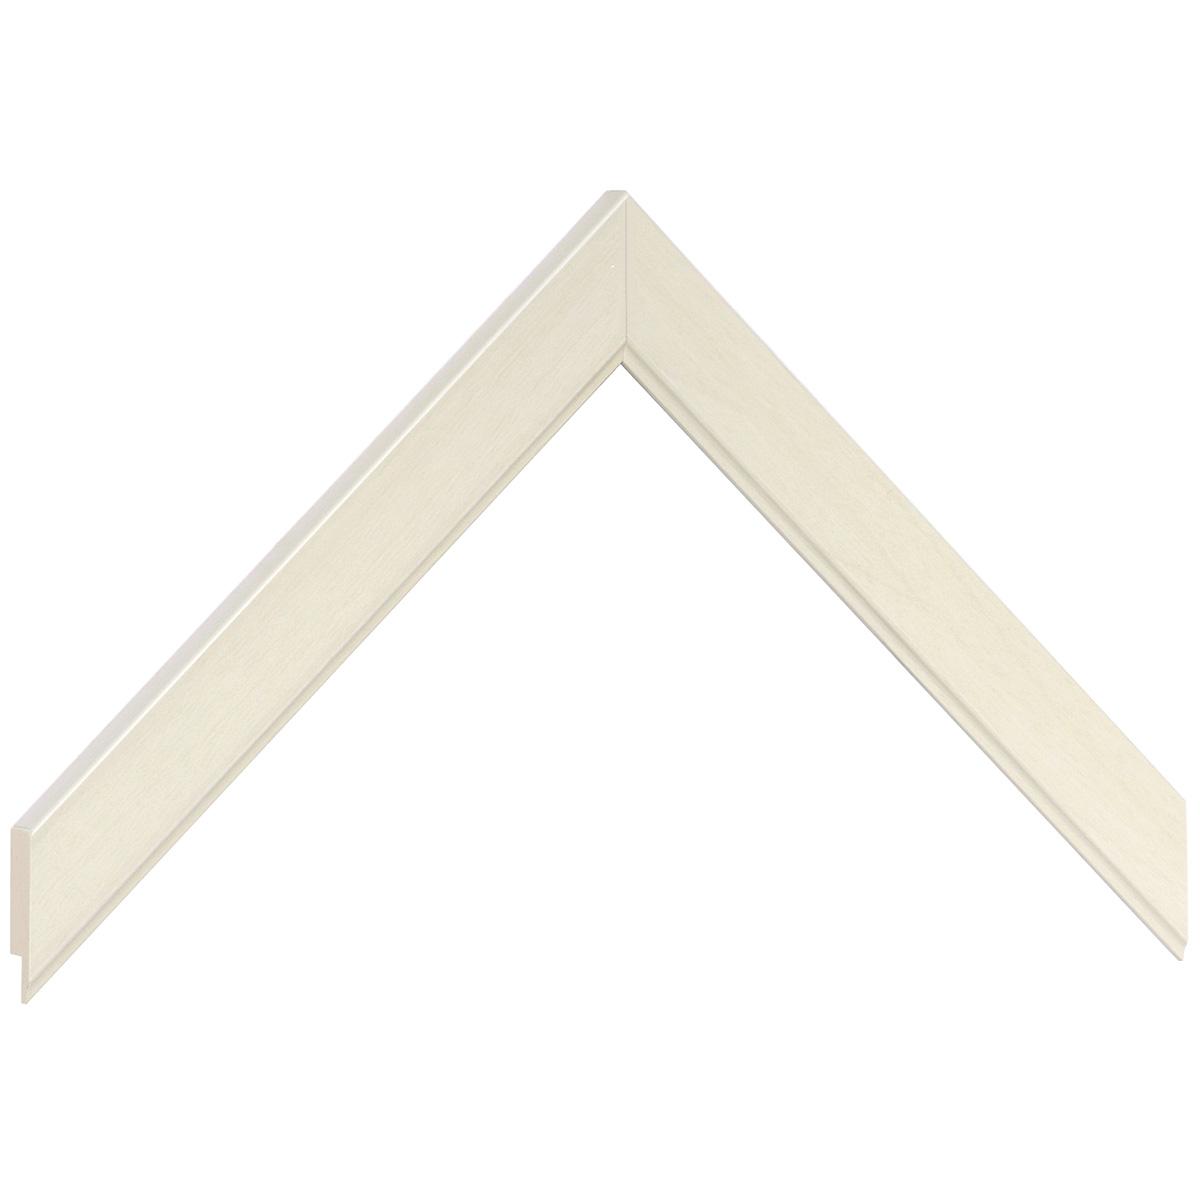 Liner ayous - Width 21mm Height 10